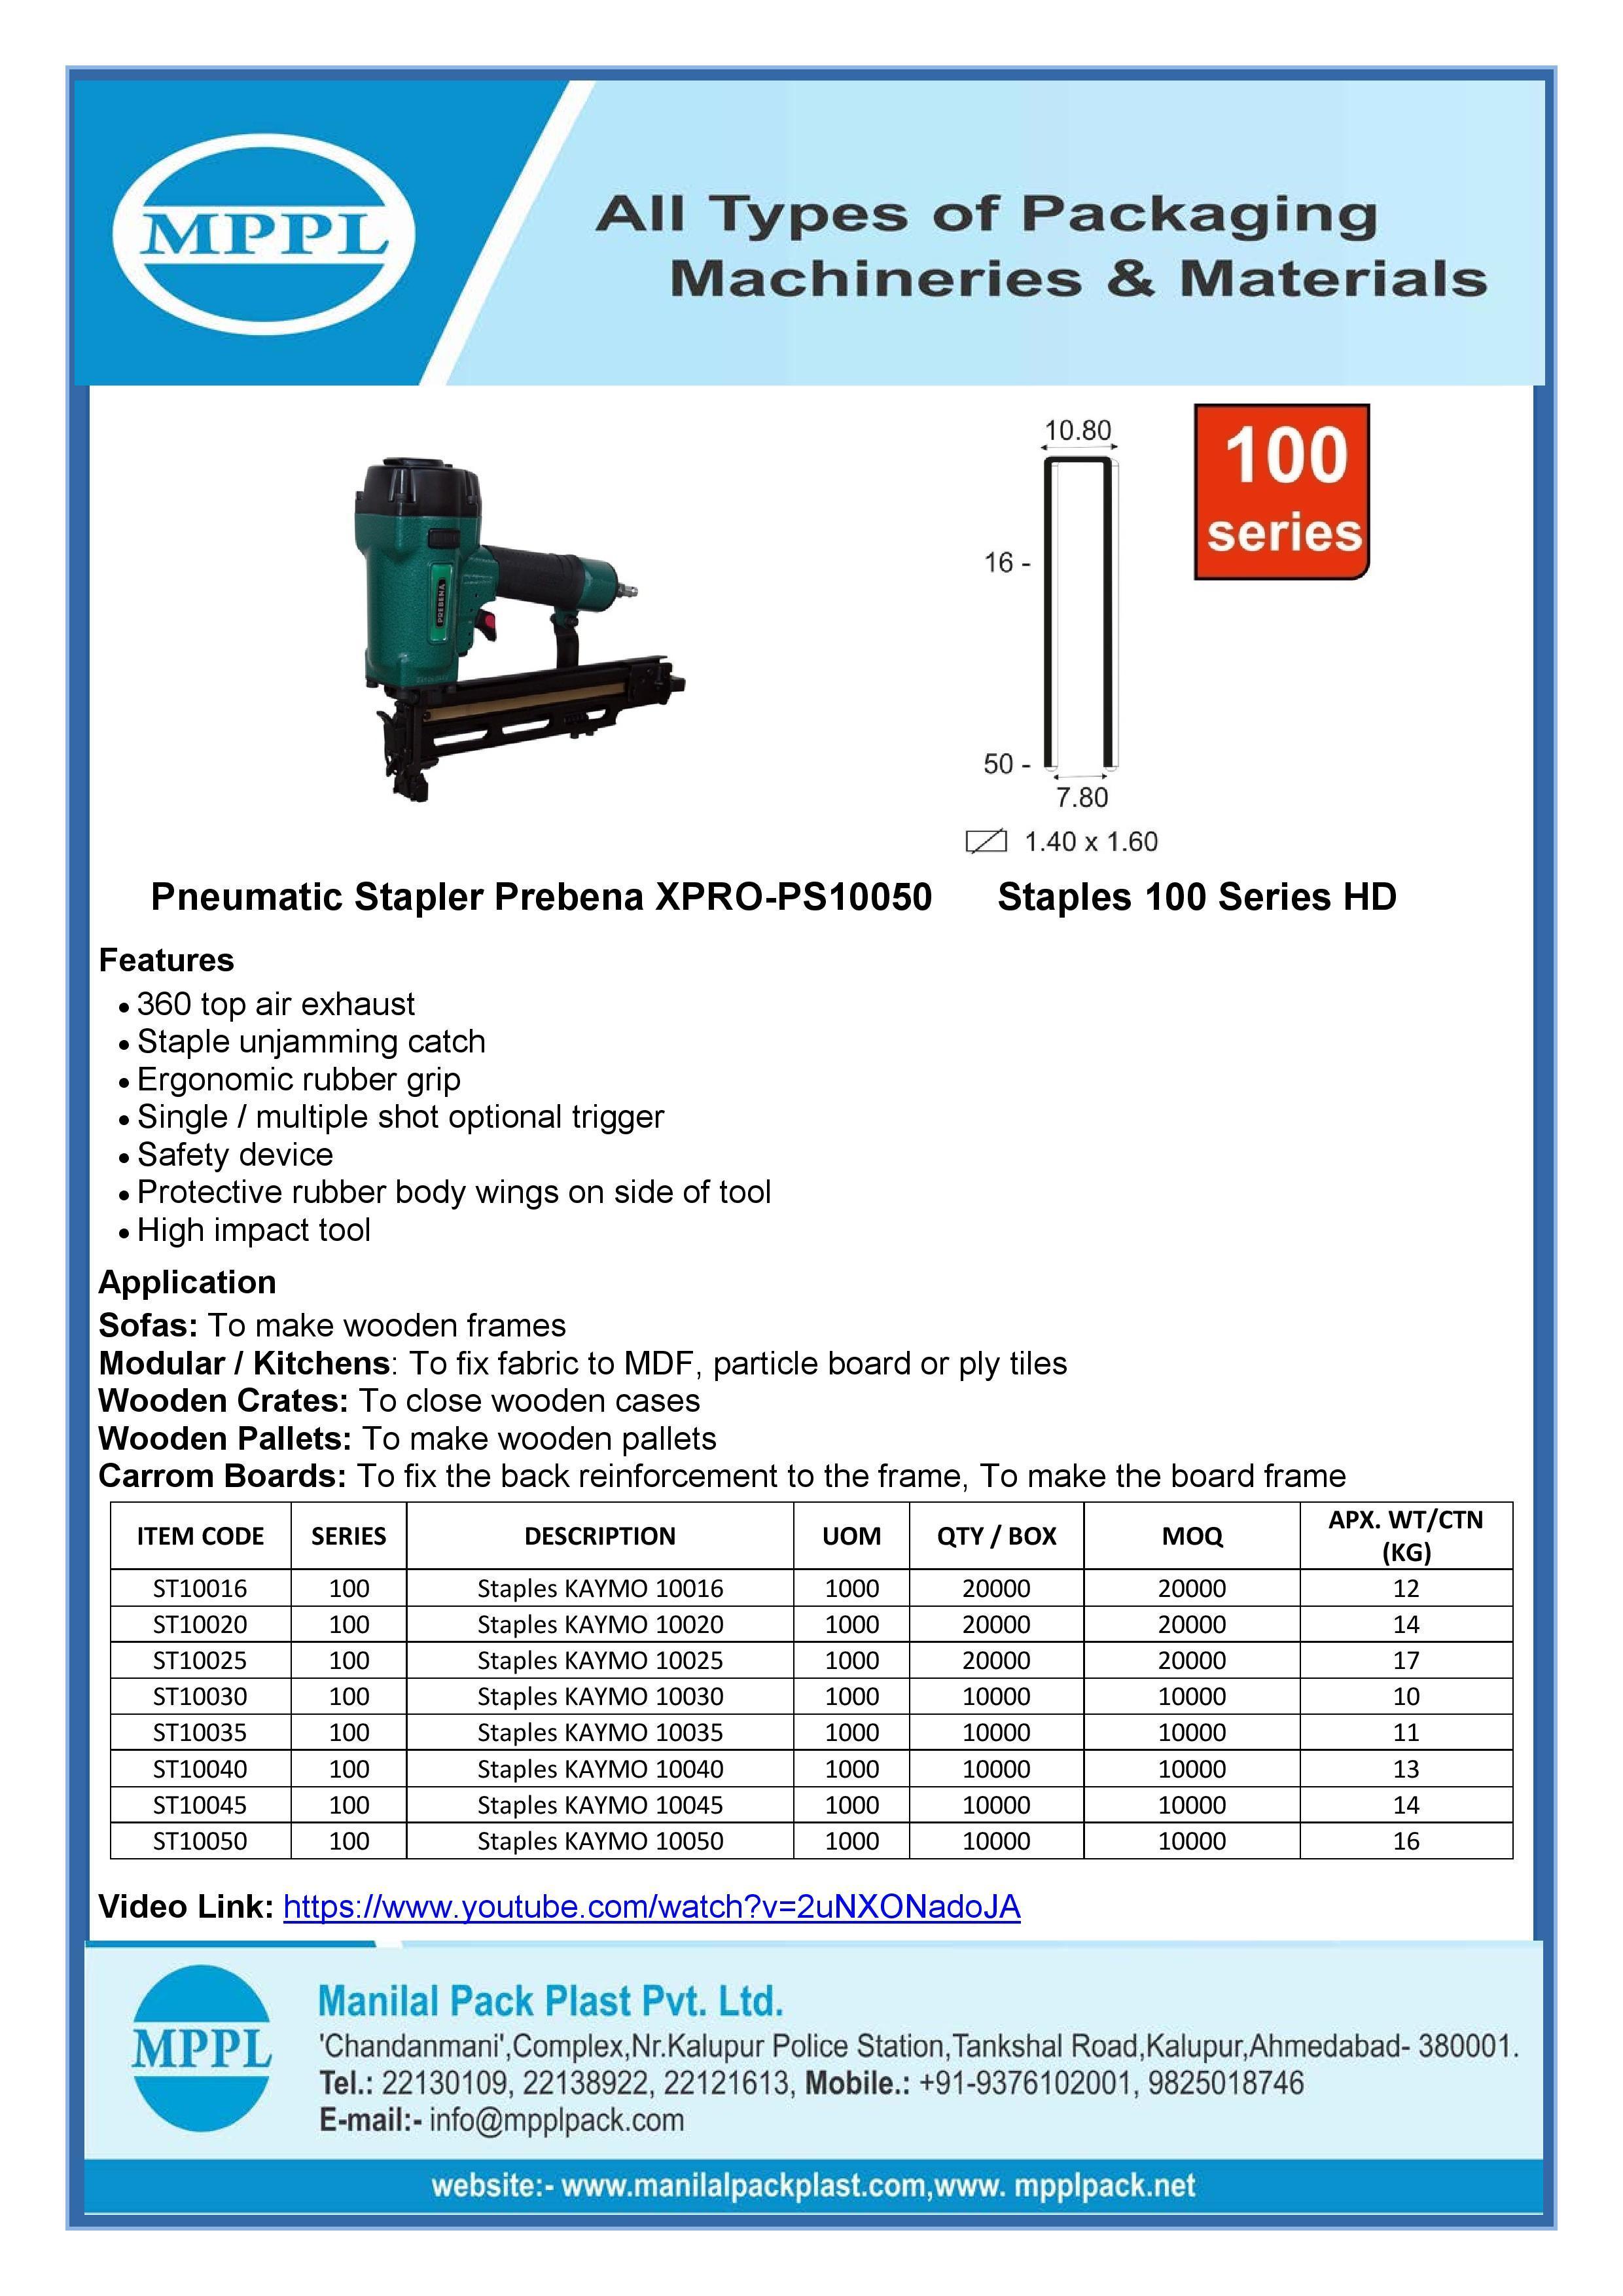 Pneumatic Stapler Prebena XPRO-PS10050